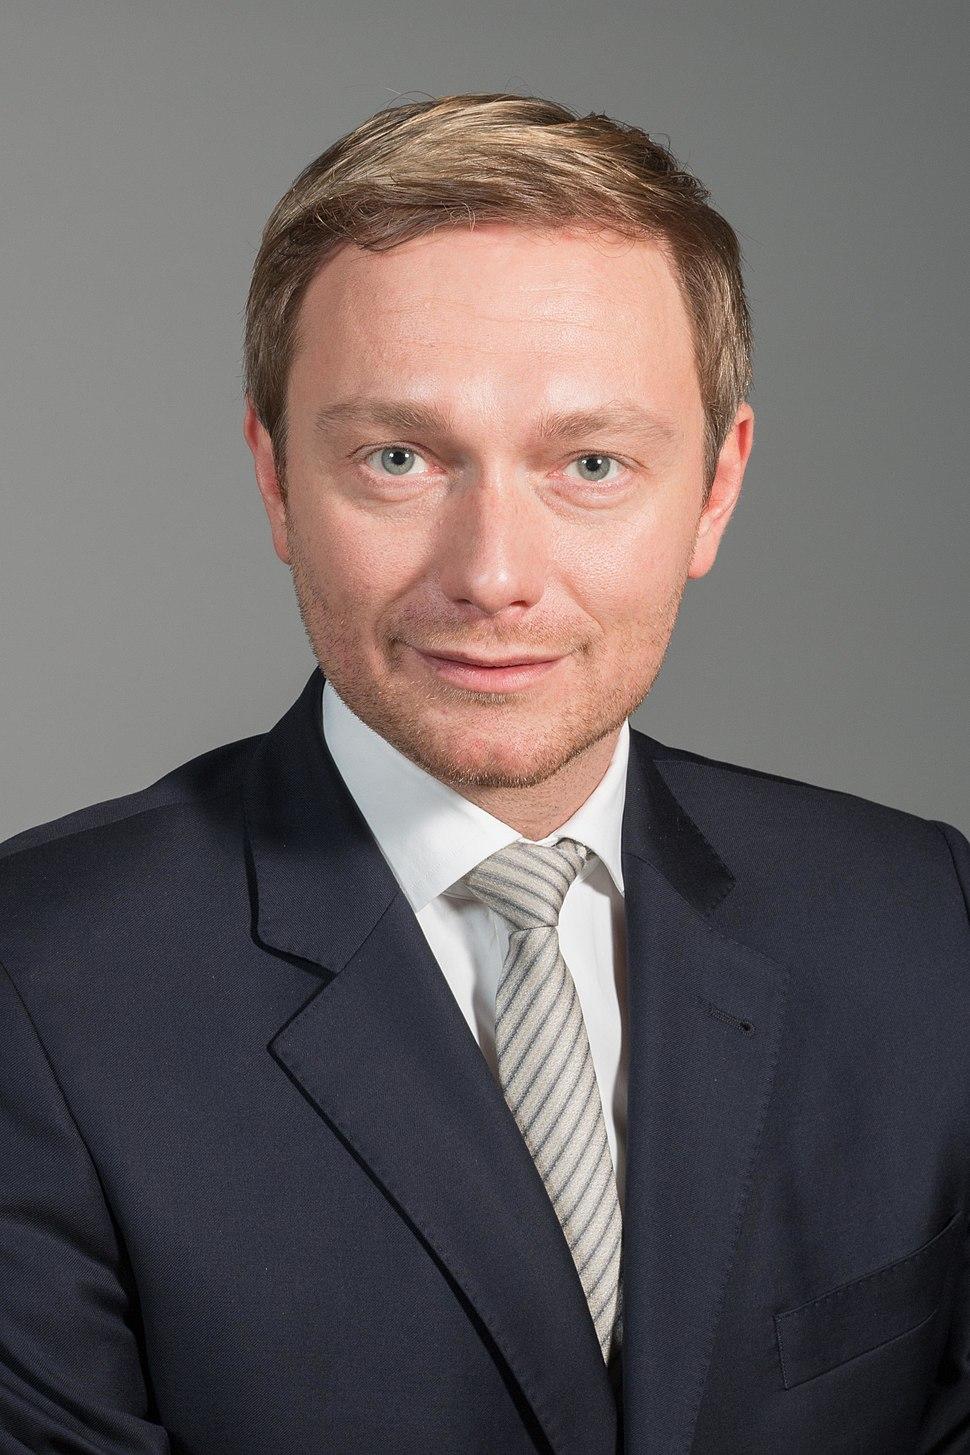 ChristianLindner-FDP-1